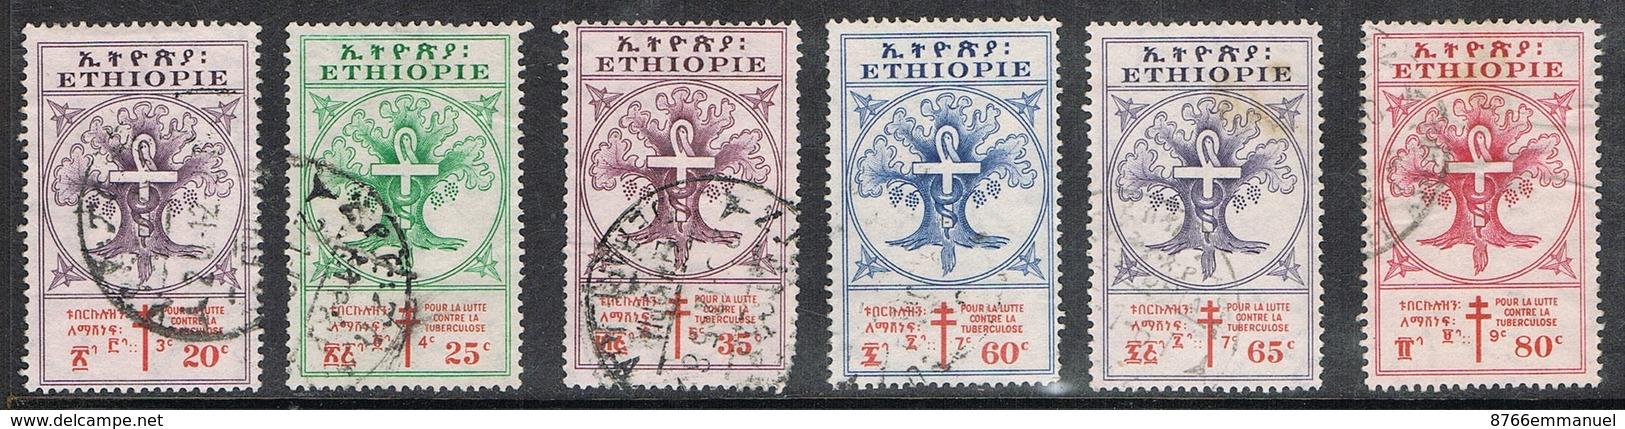 ETHIOPIE N°343 A 348 - Ethiopie